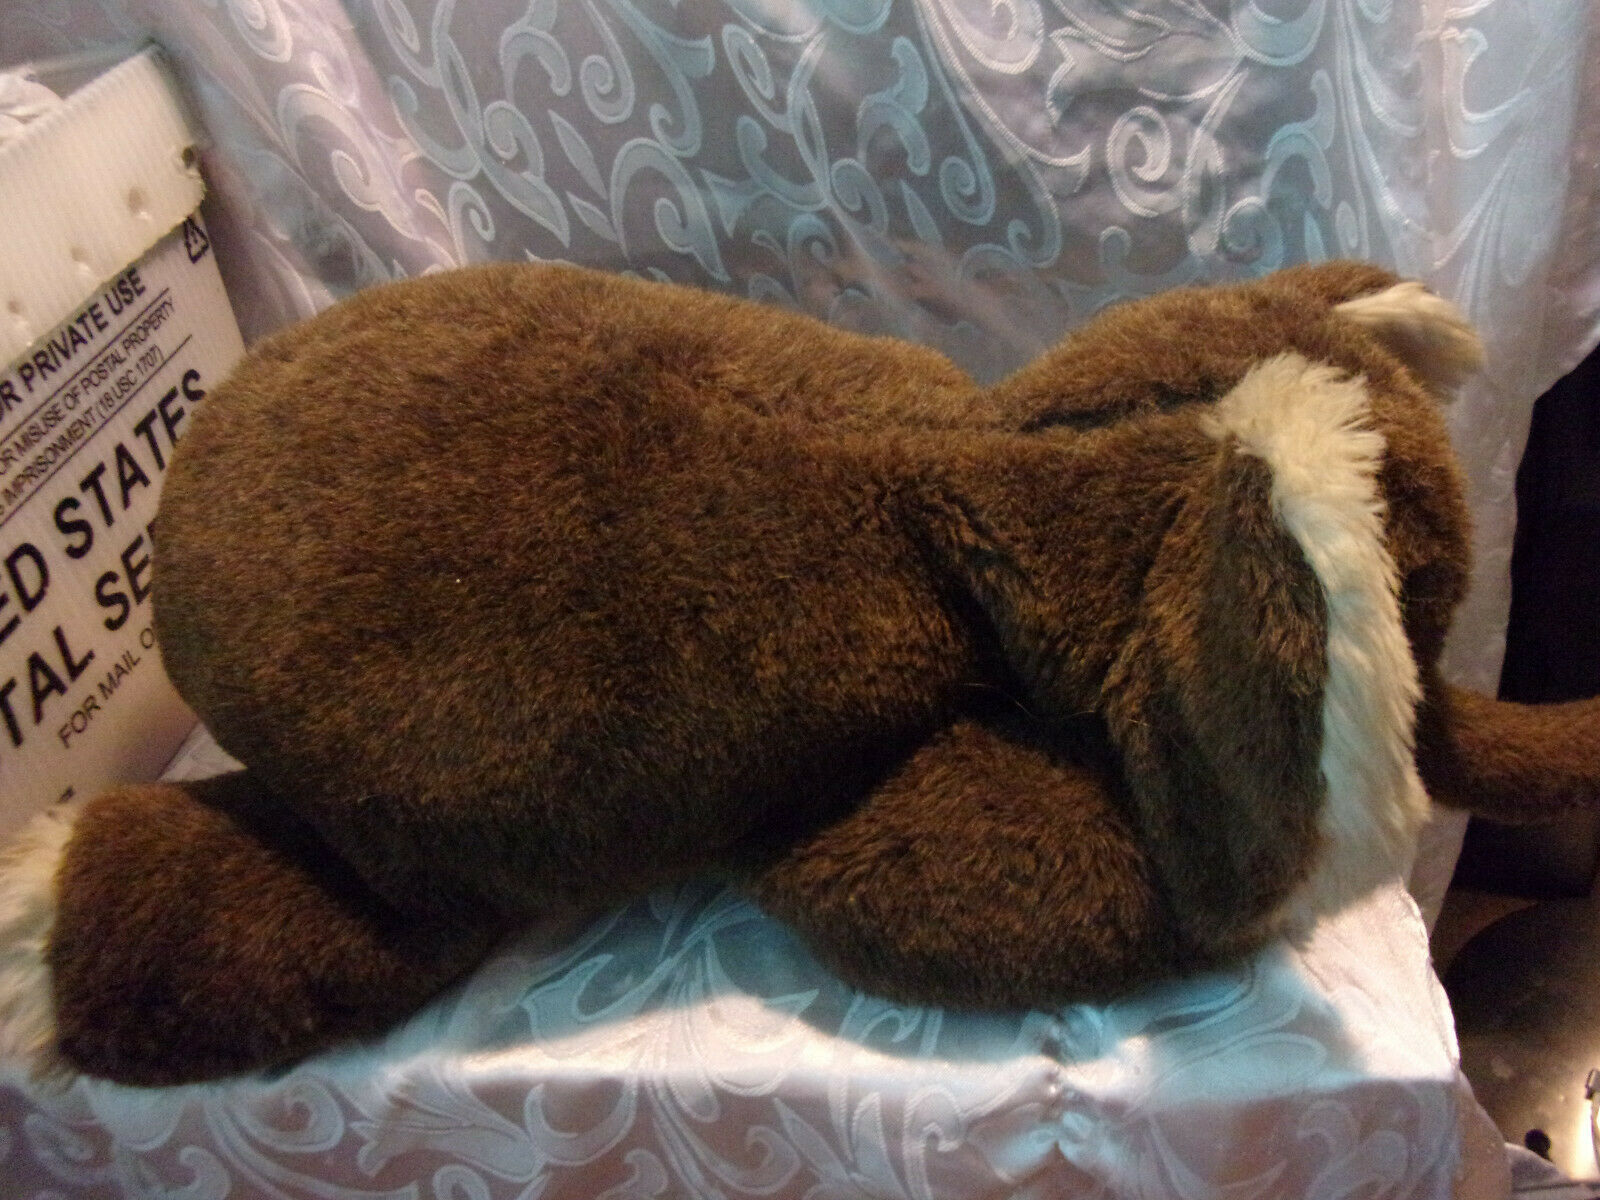 Toyland Made in Israel Brown Elephant 27  Plush Soft Toy Stuffed Animal